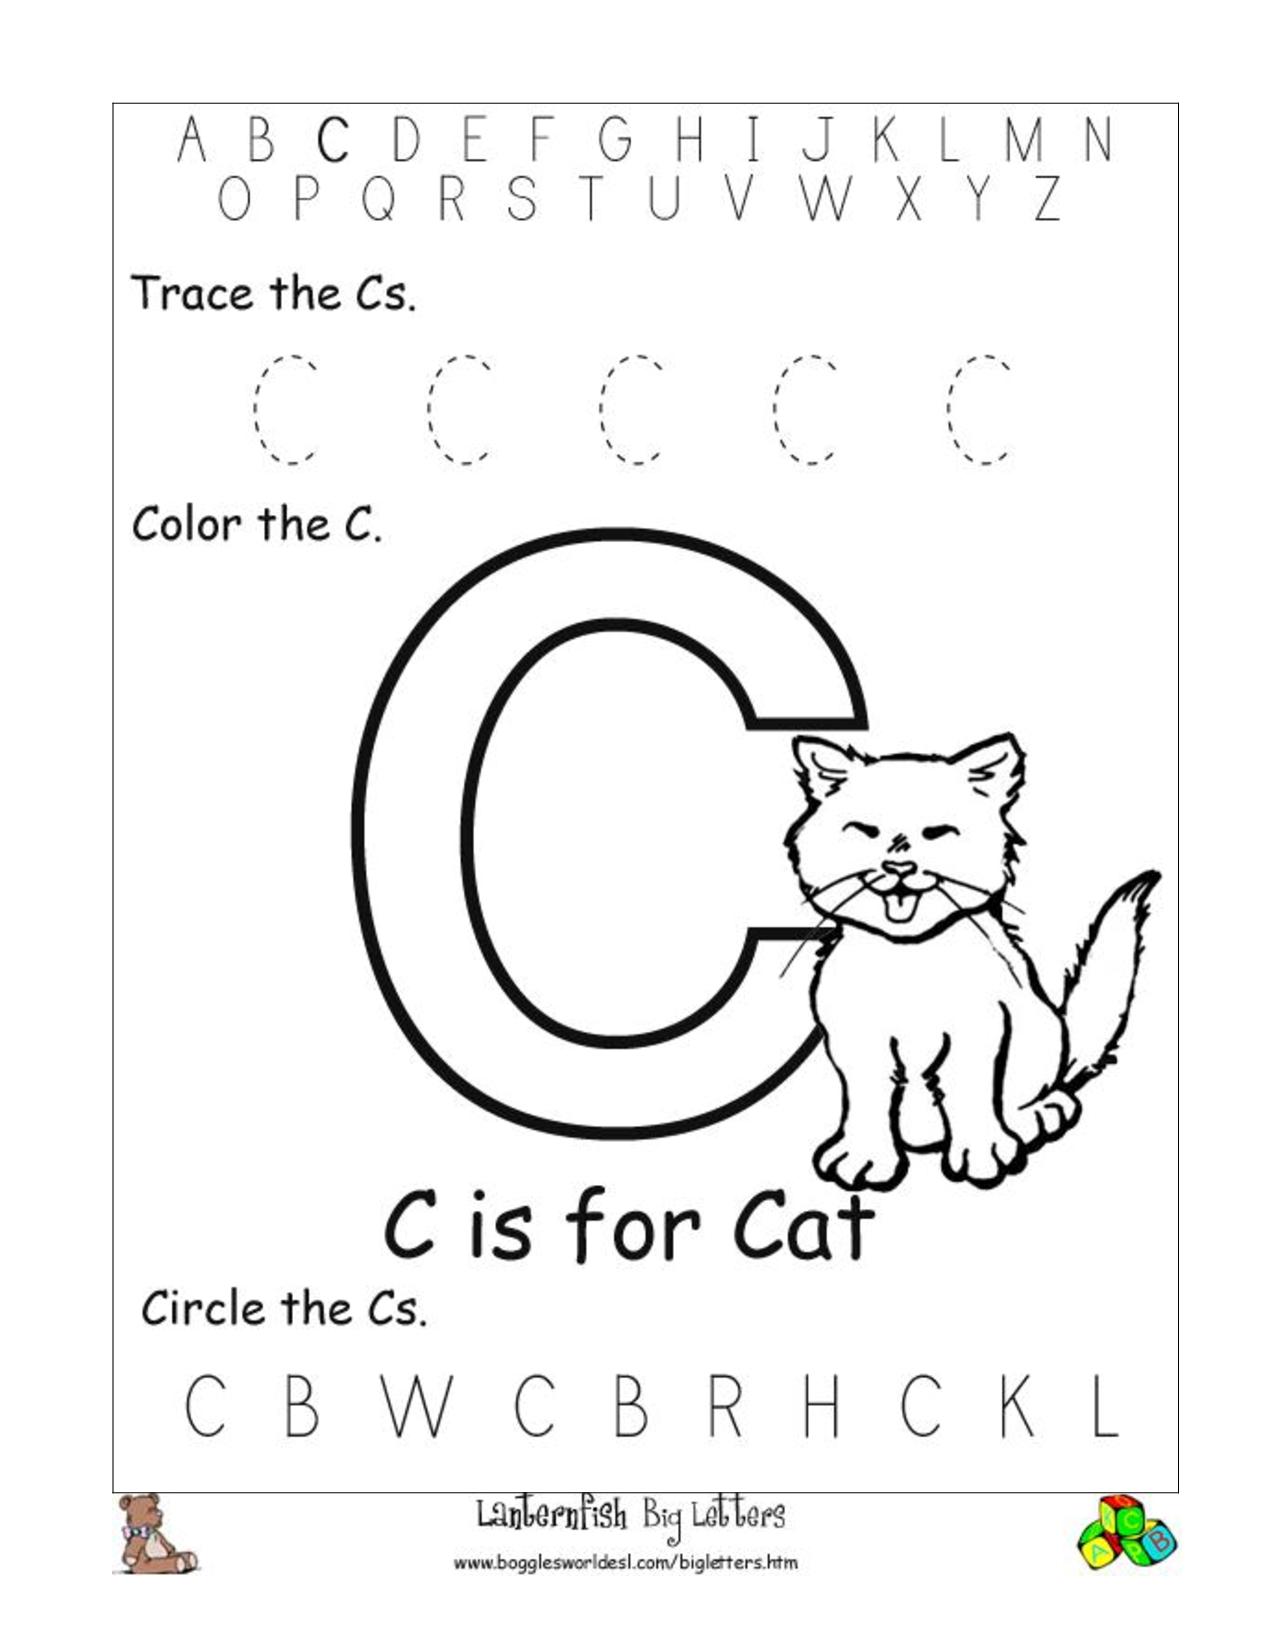 6 Best Images Of Free Printable Preschool Worksheets Letter C   Day - Free Printable Preschool Worksheets Letter C